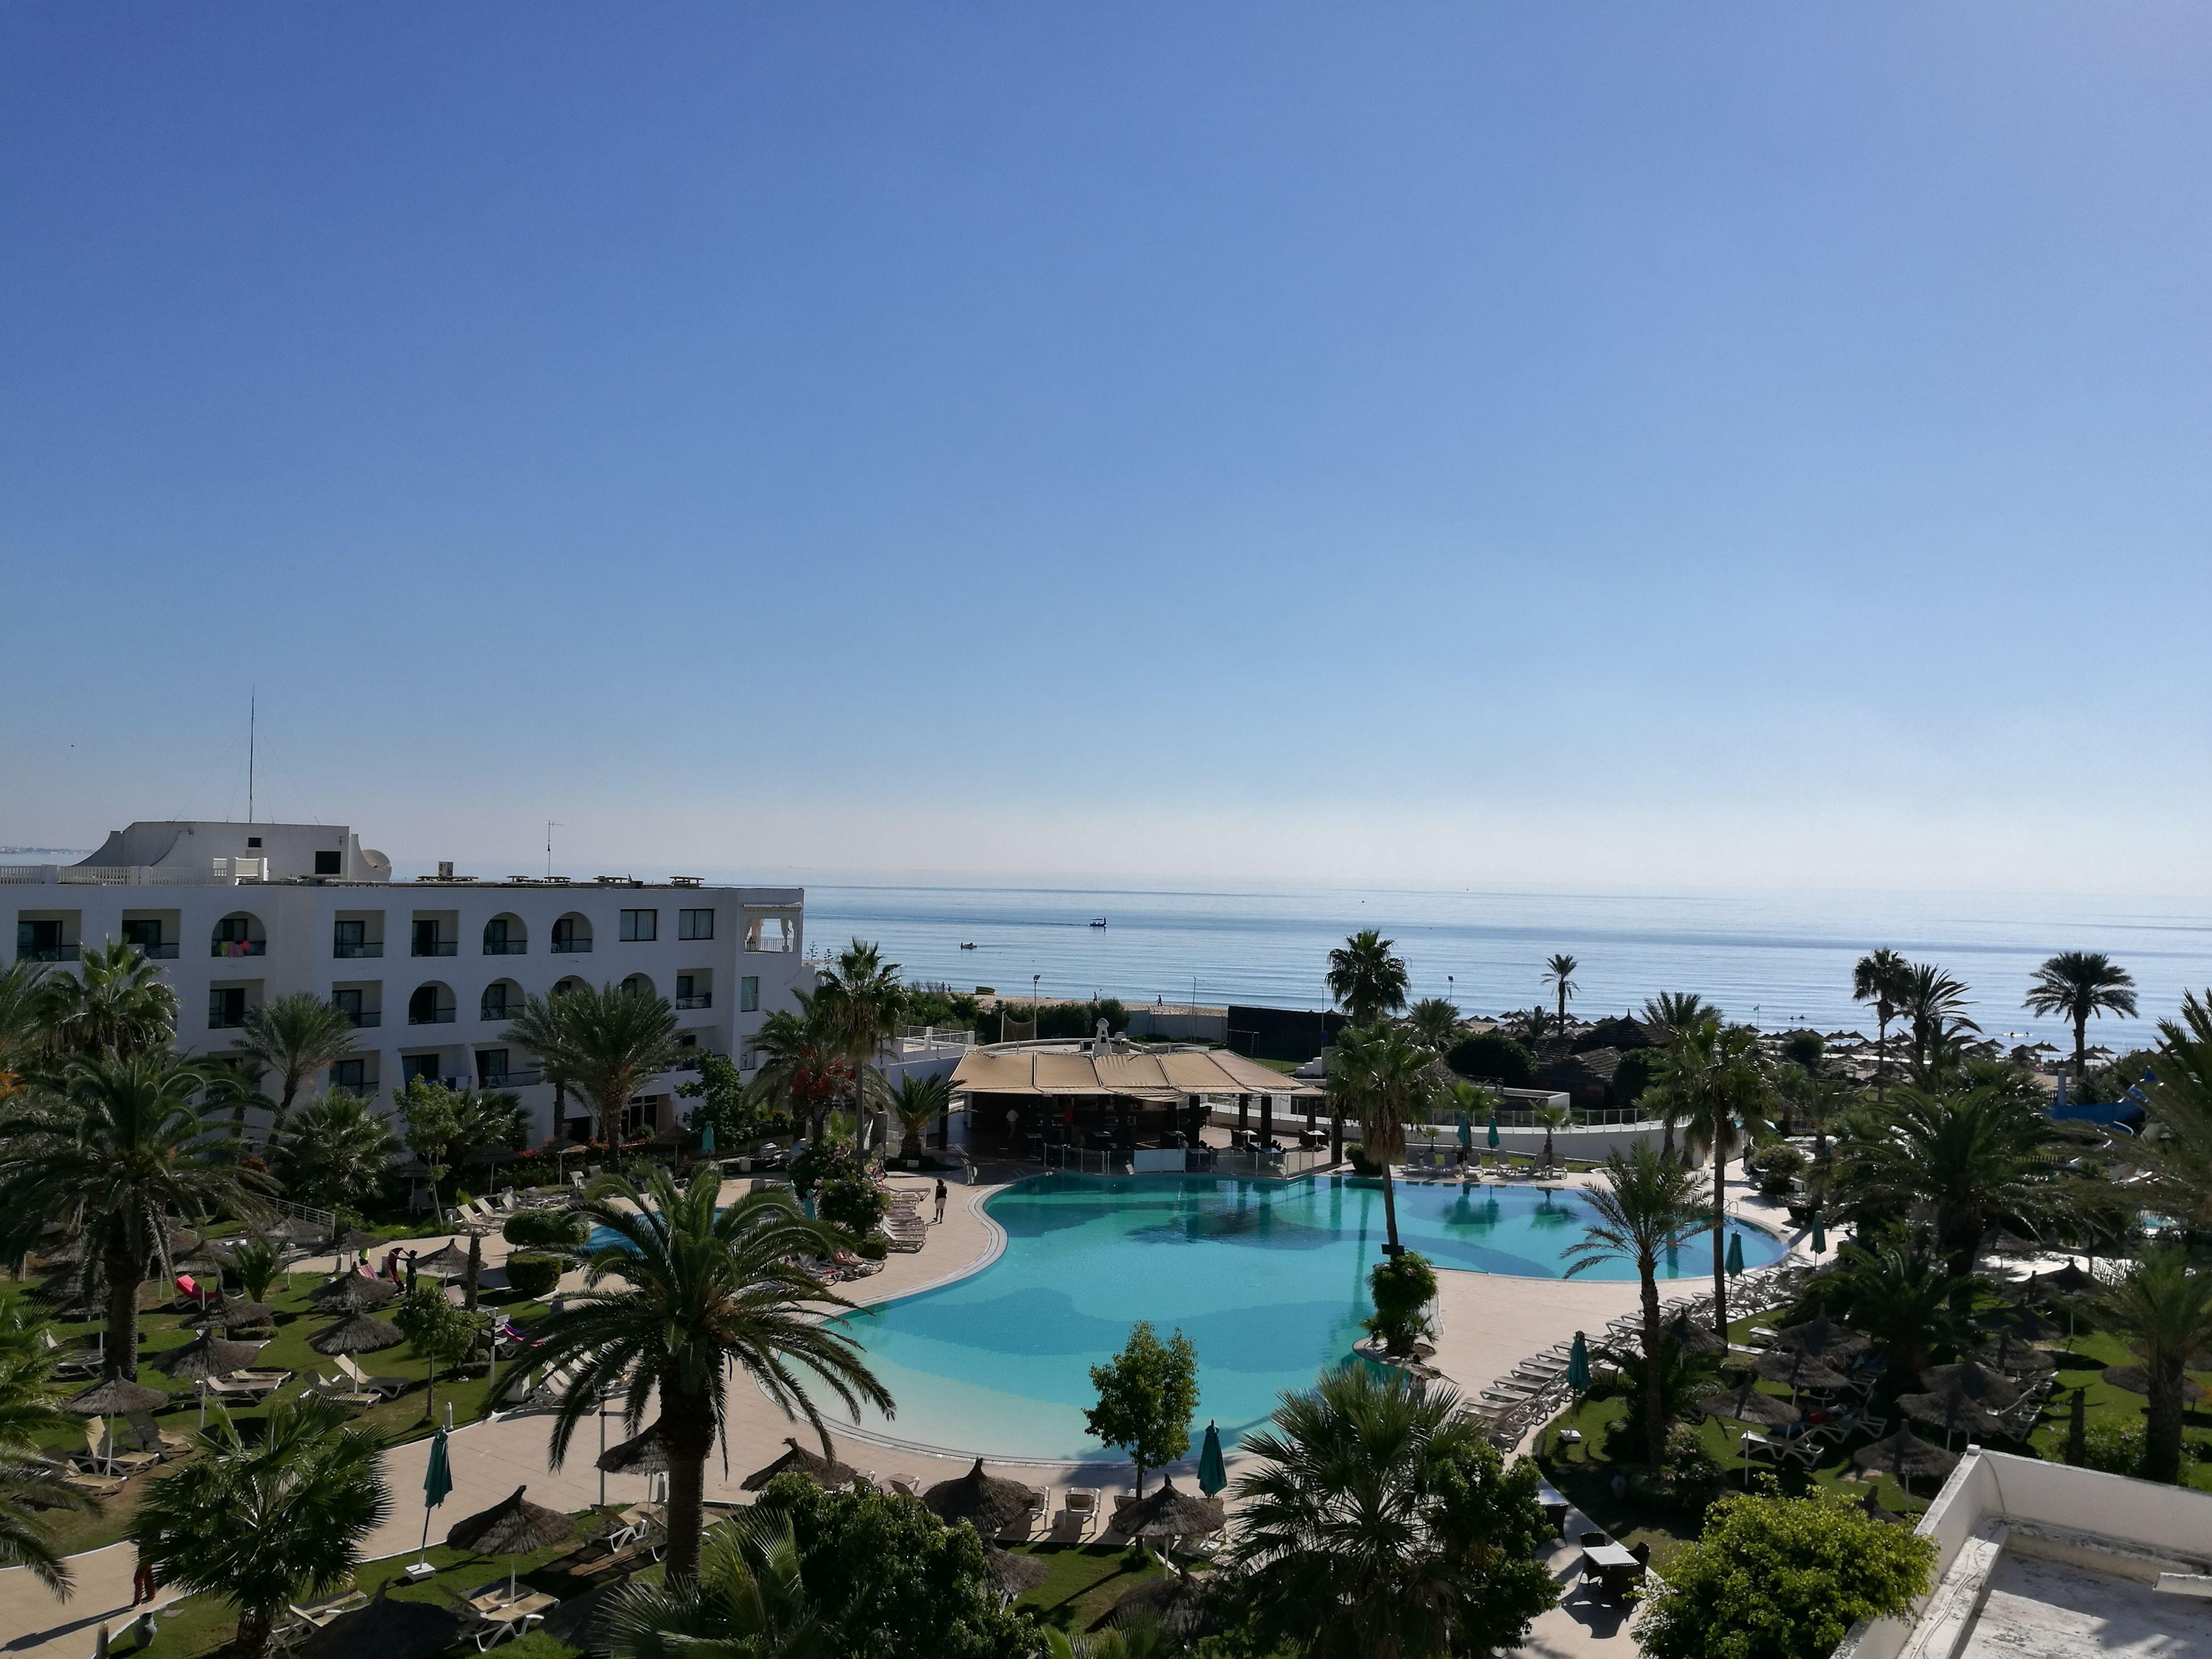 Sea Beach Water Tourist Resort Palm Tree Day Hammamet Tunisia Pool